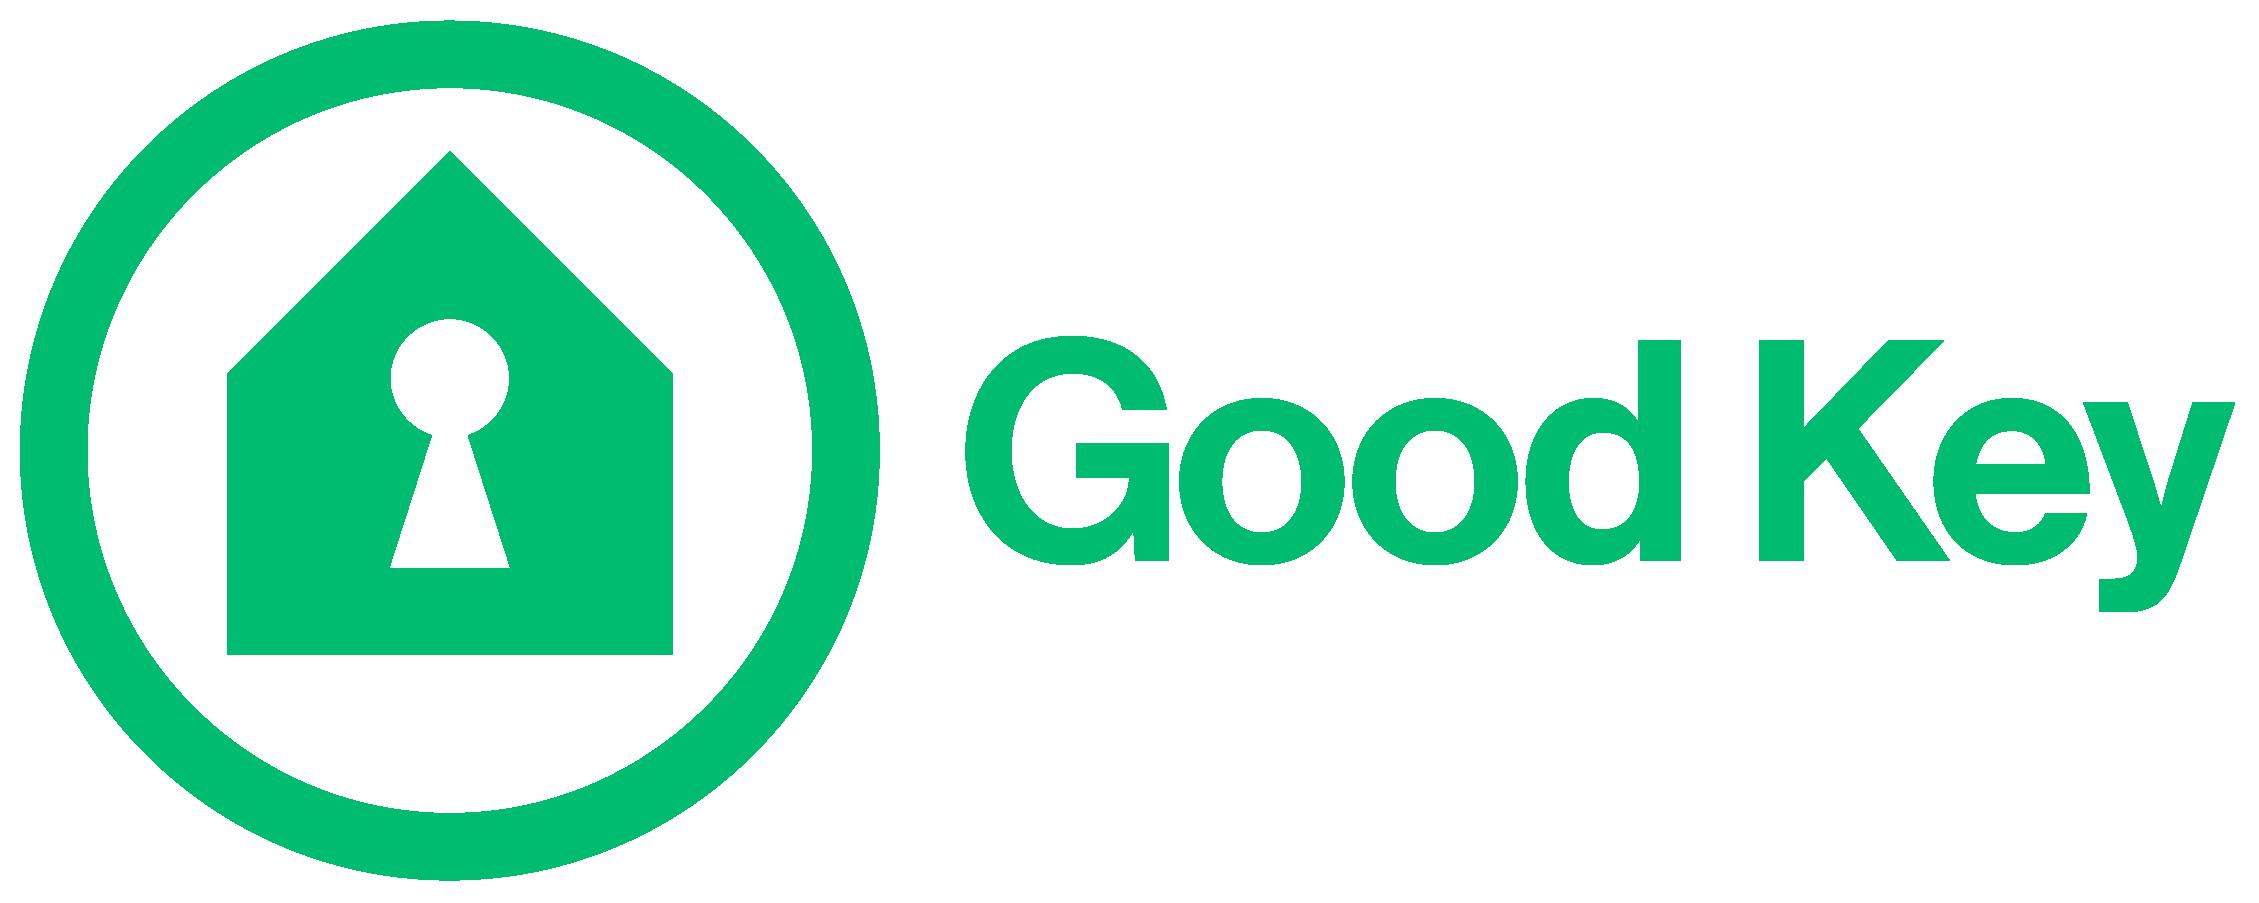 GoodKey_Brandmark_Horizontal_Green_Web_RGB@2x.png